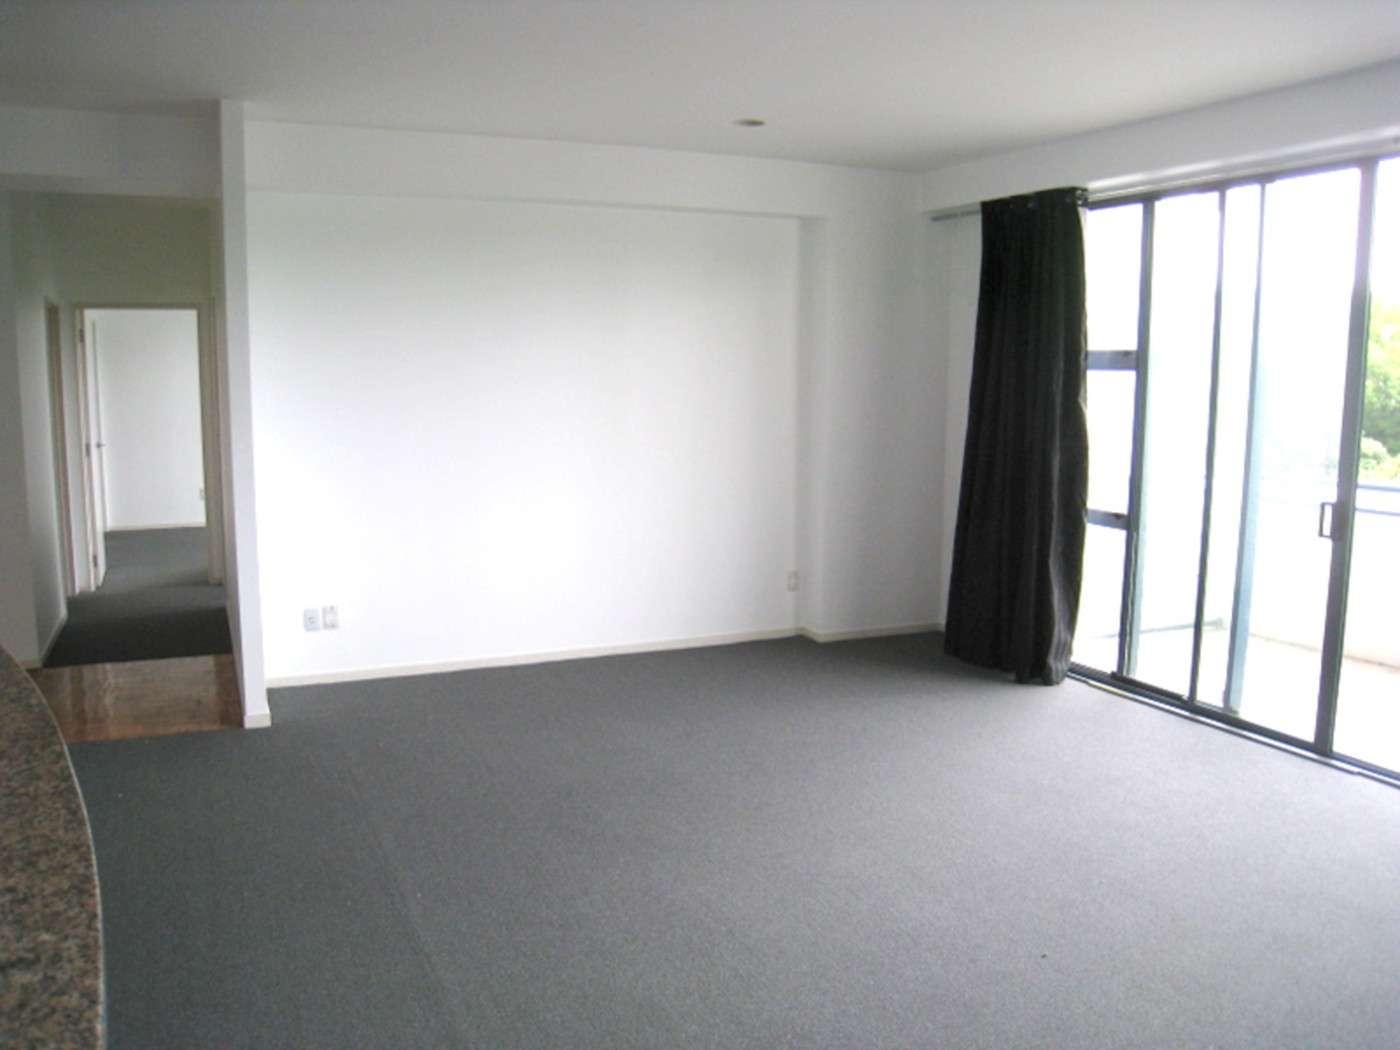 3I/220 Victoria Street West, FREEMANS BAY, Auckland City 1011